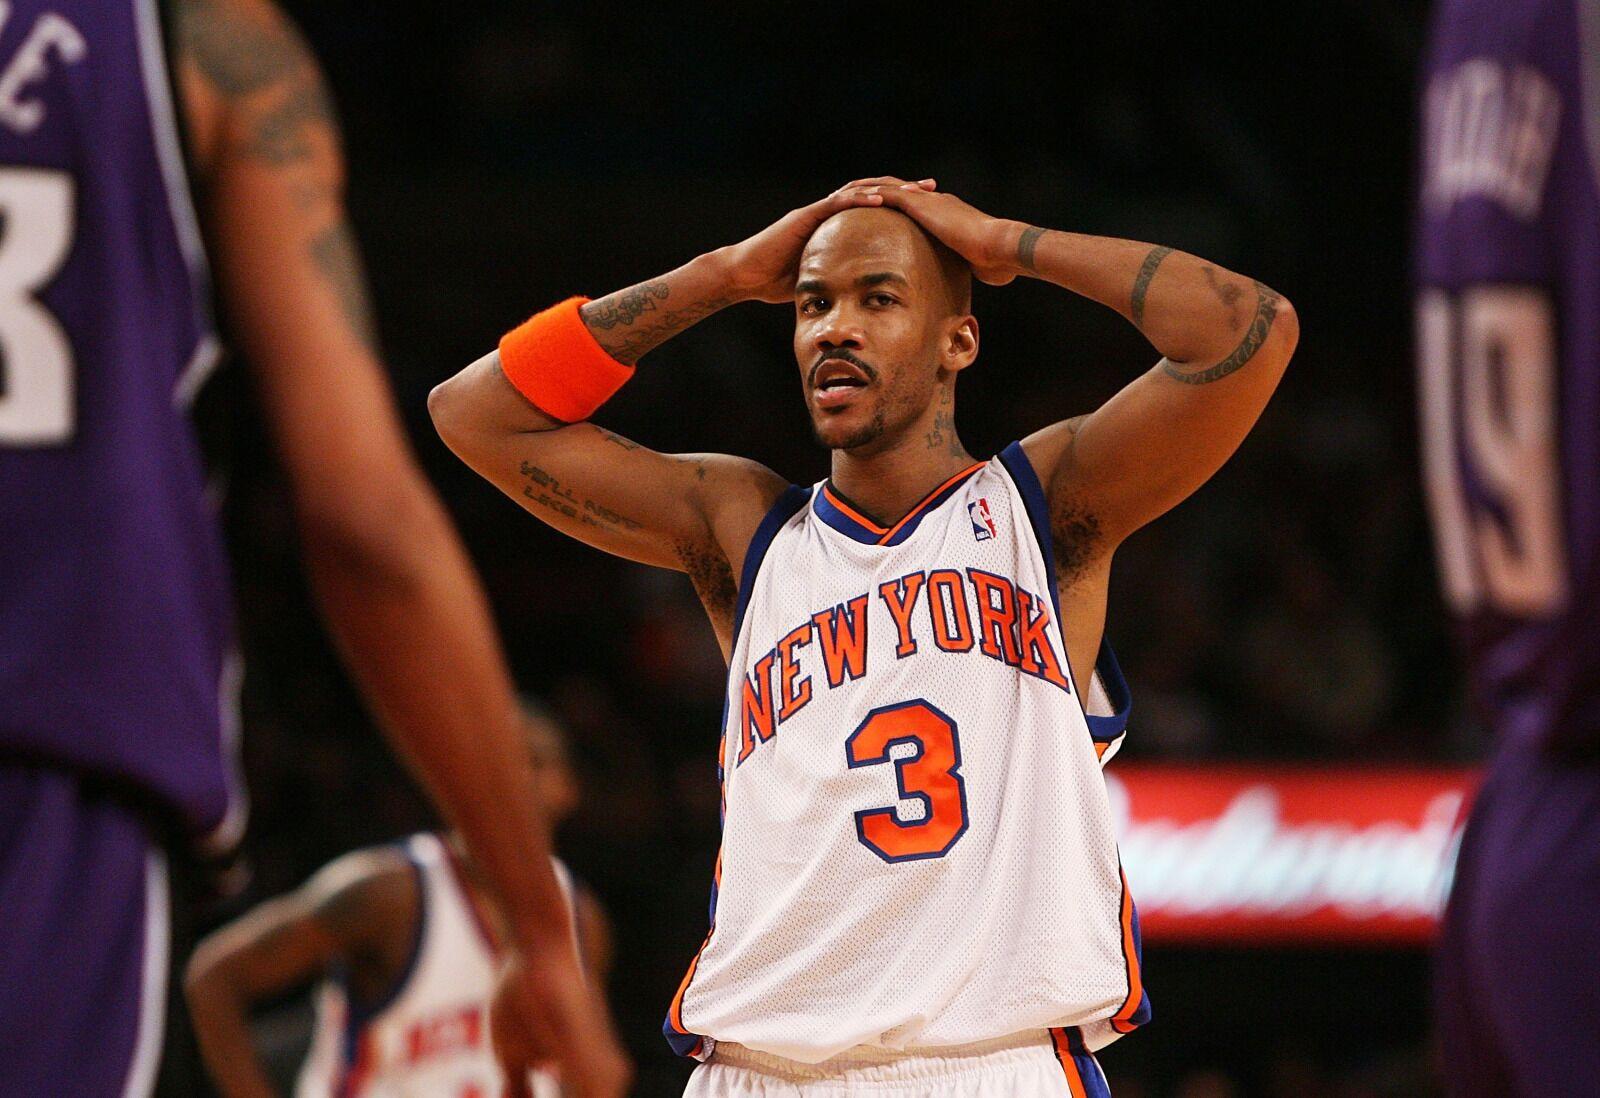 New York Knicks: New York Knicks: Puma Clyde Vs. Starbury- The Battle Of